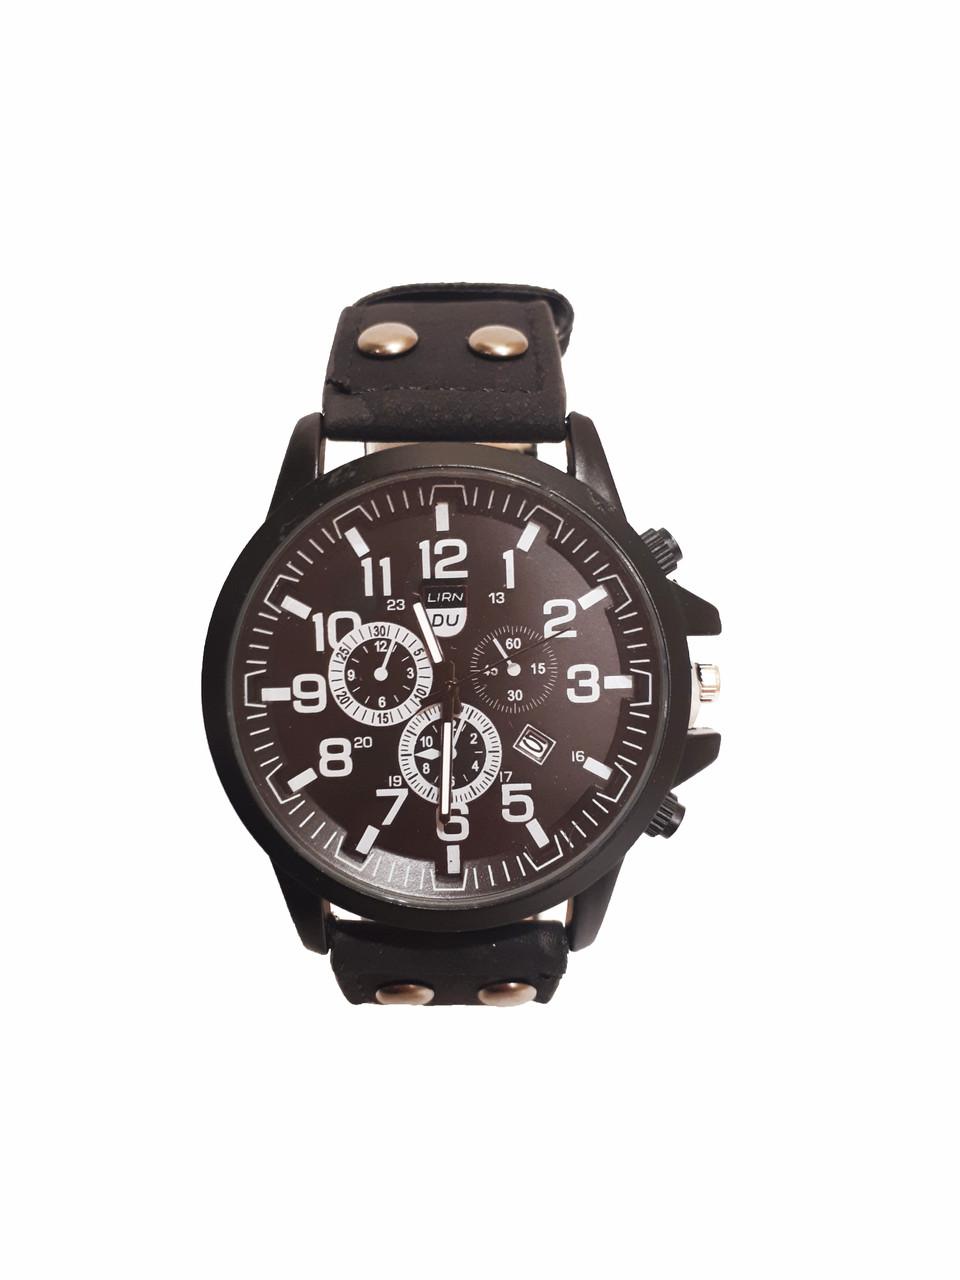 Часы мужские кварцевые DU Черные (DU-030B)